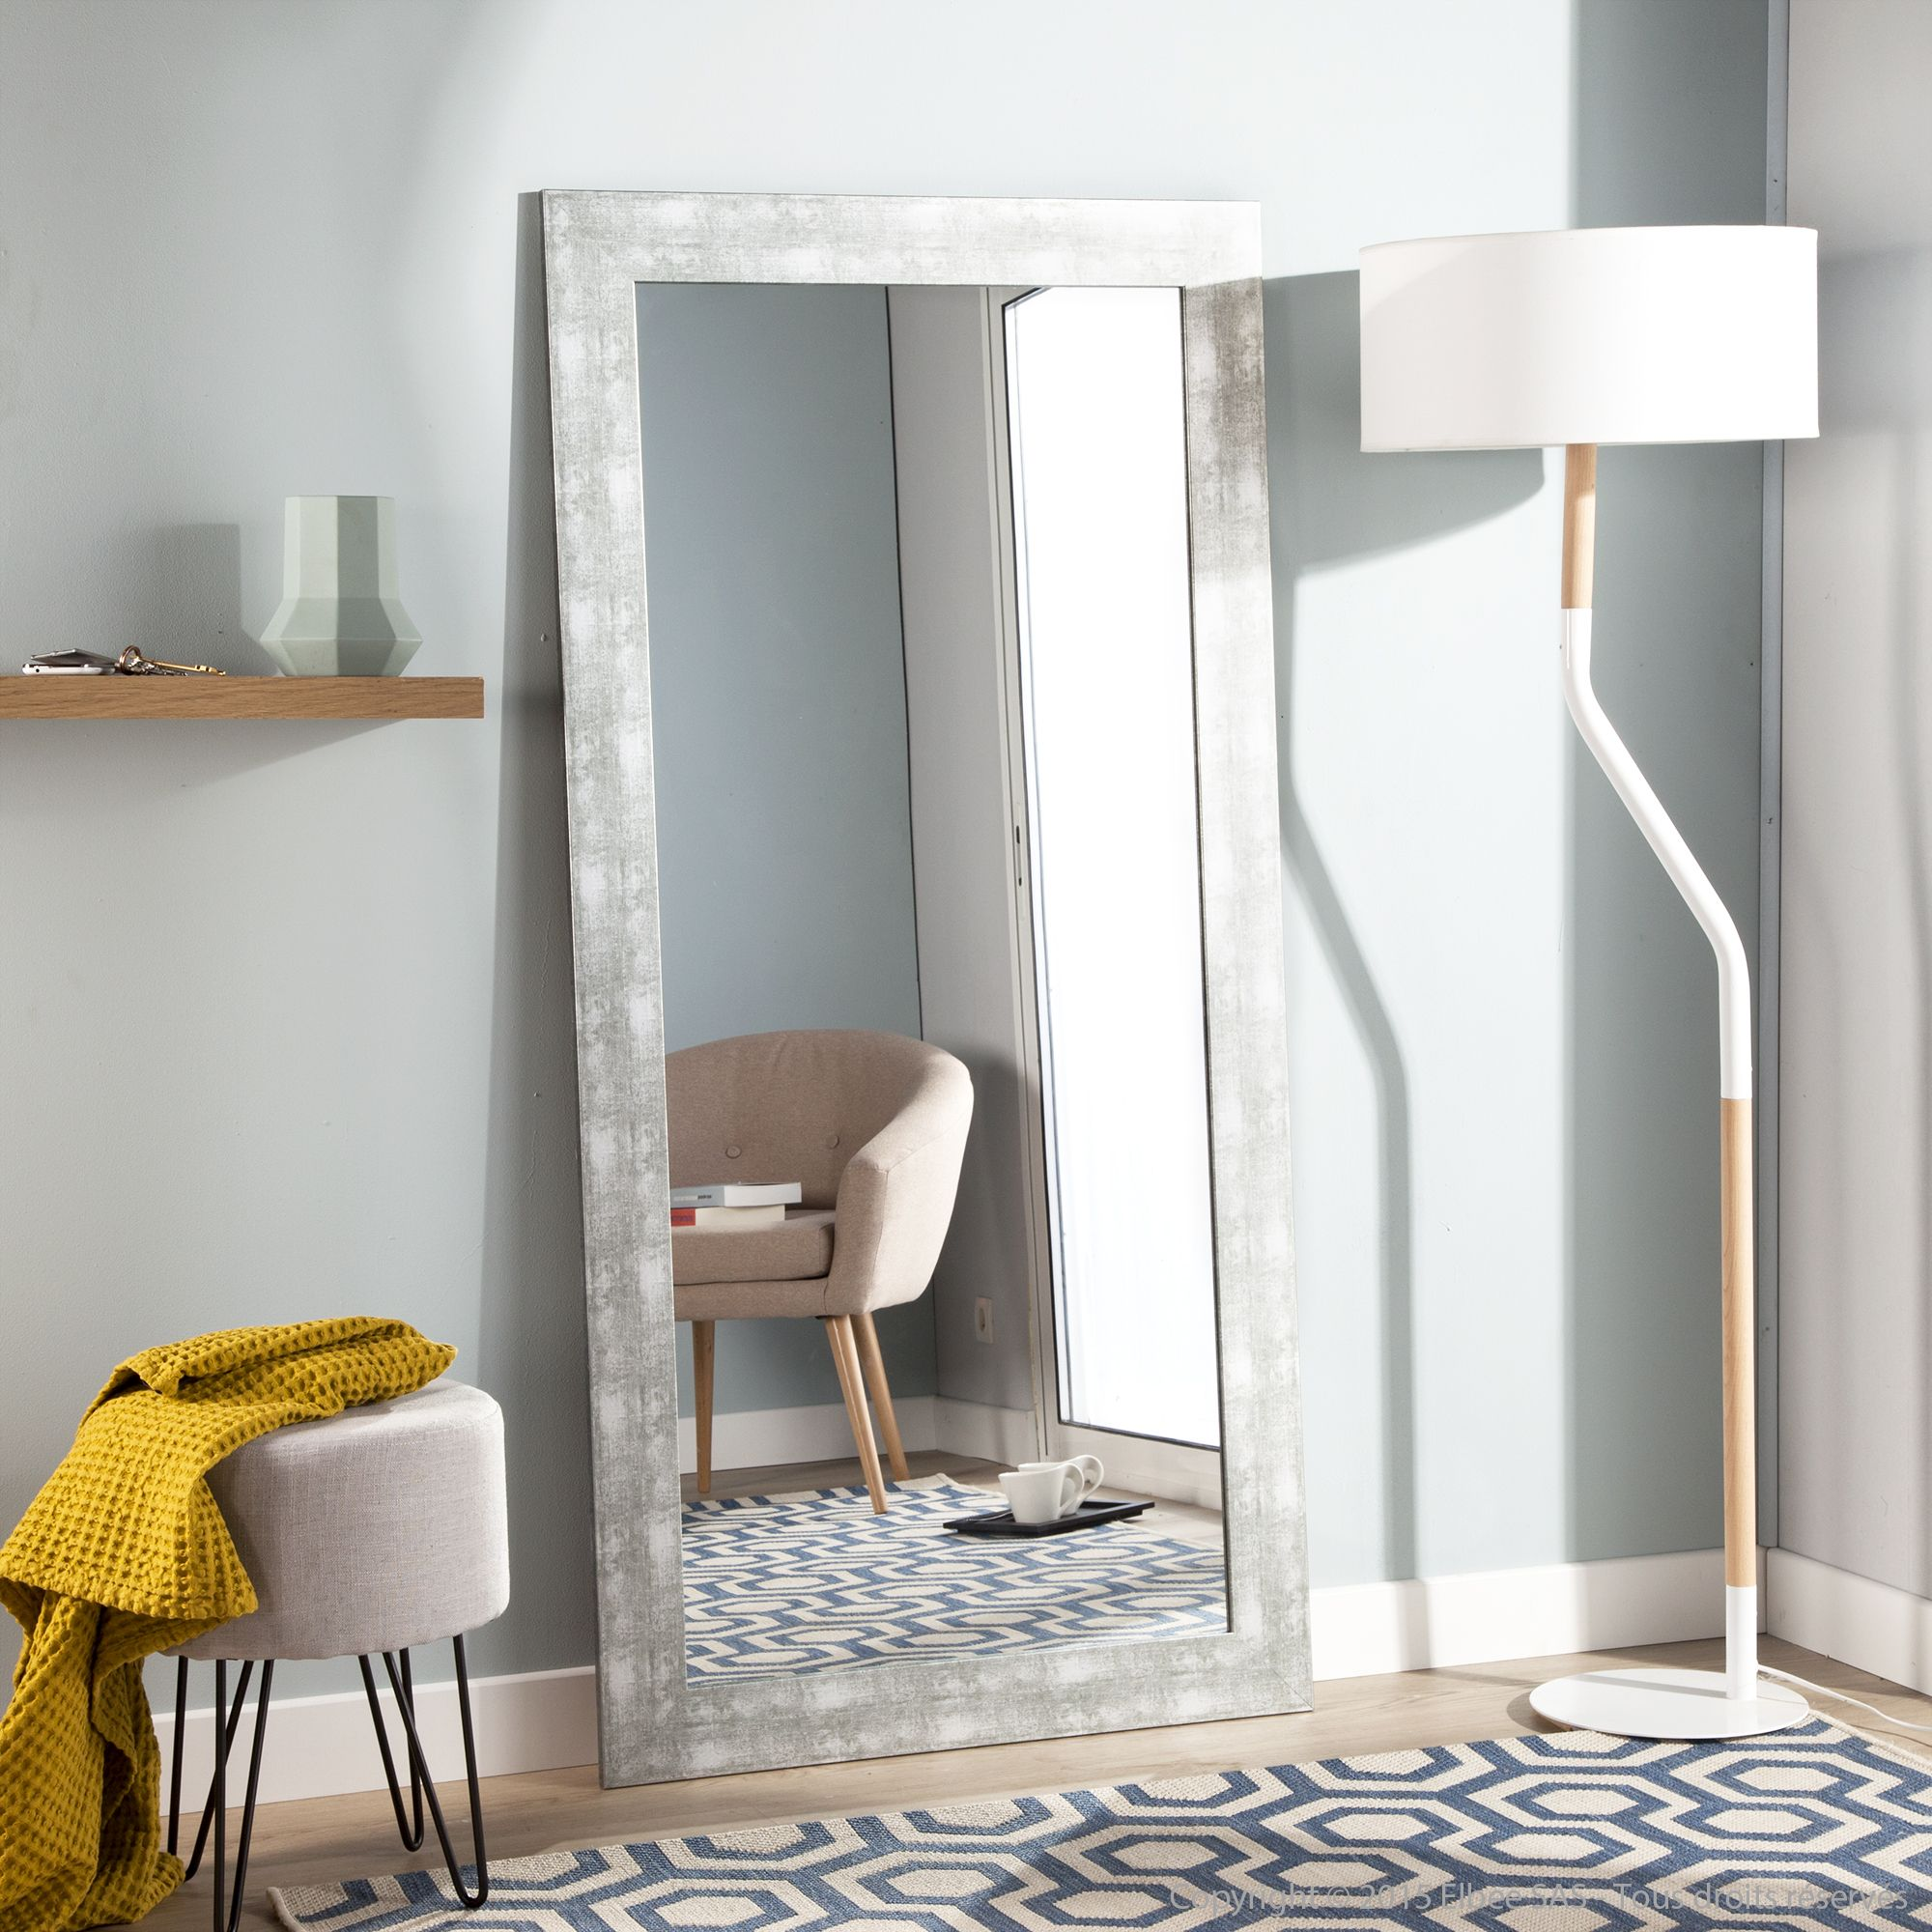 miroir rectangulaire en bois mdf finition mat chic axe. Black Bedroom Furniture Sets. Home Design Ideas